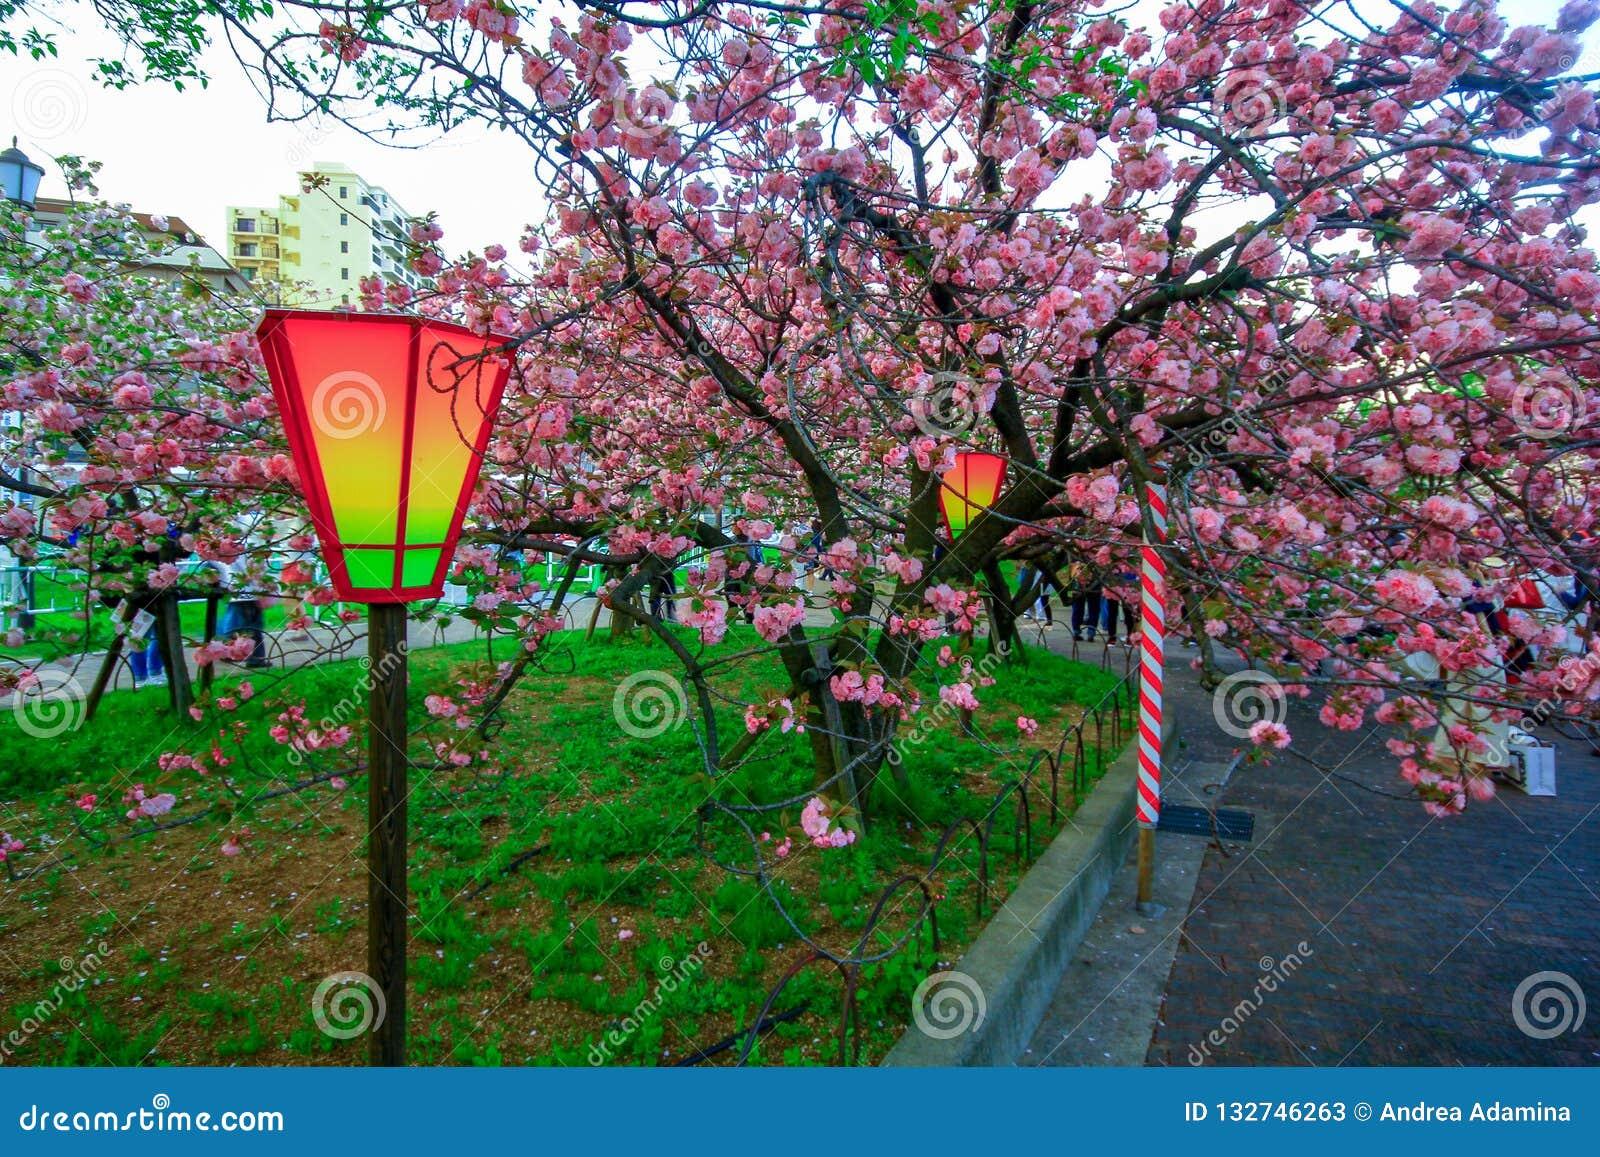 Osaka, Japan Mooie licht en kleuren van Japanse lantaarns en kersenbloesems